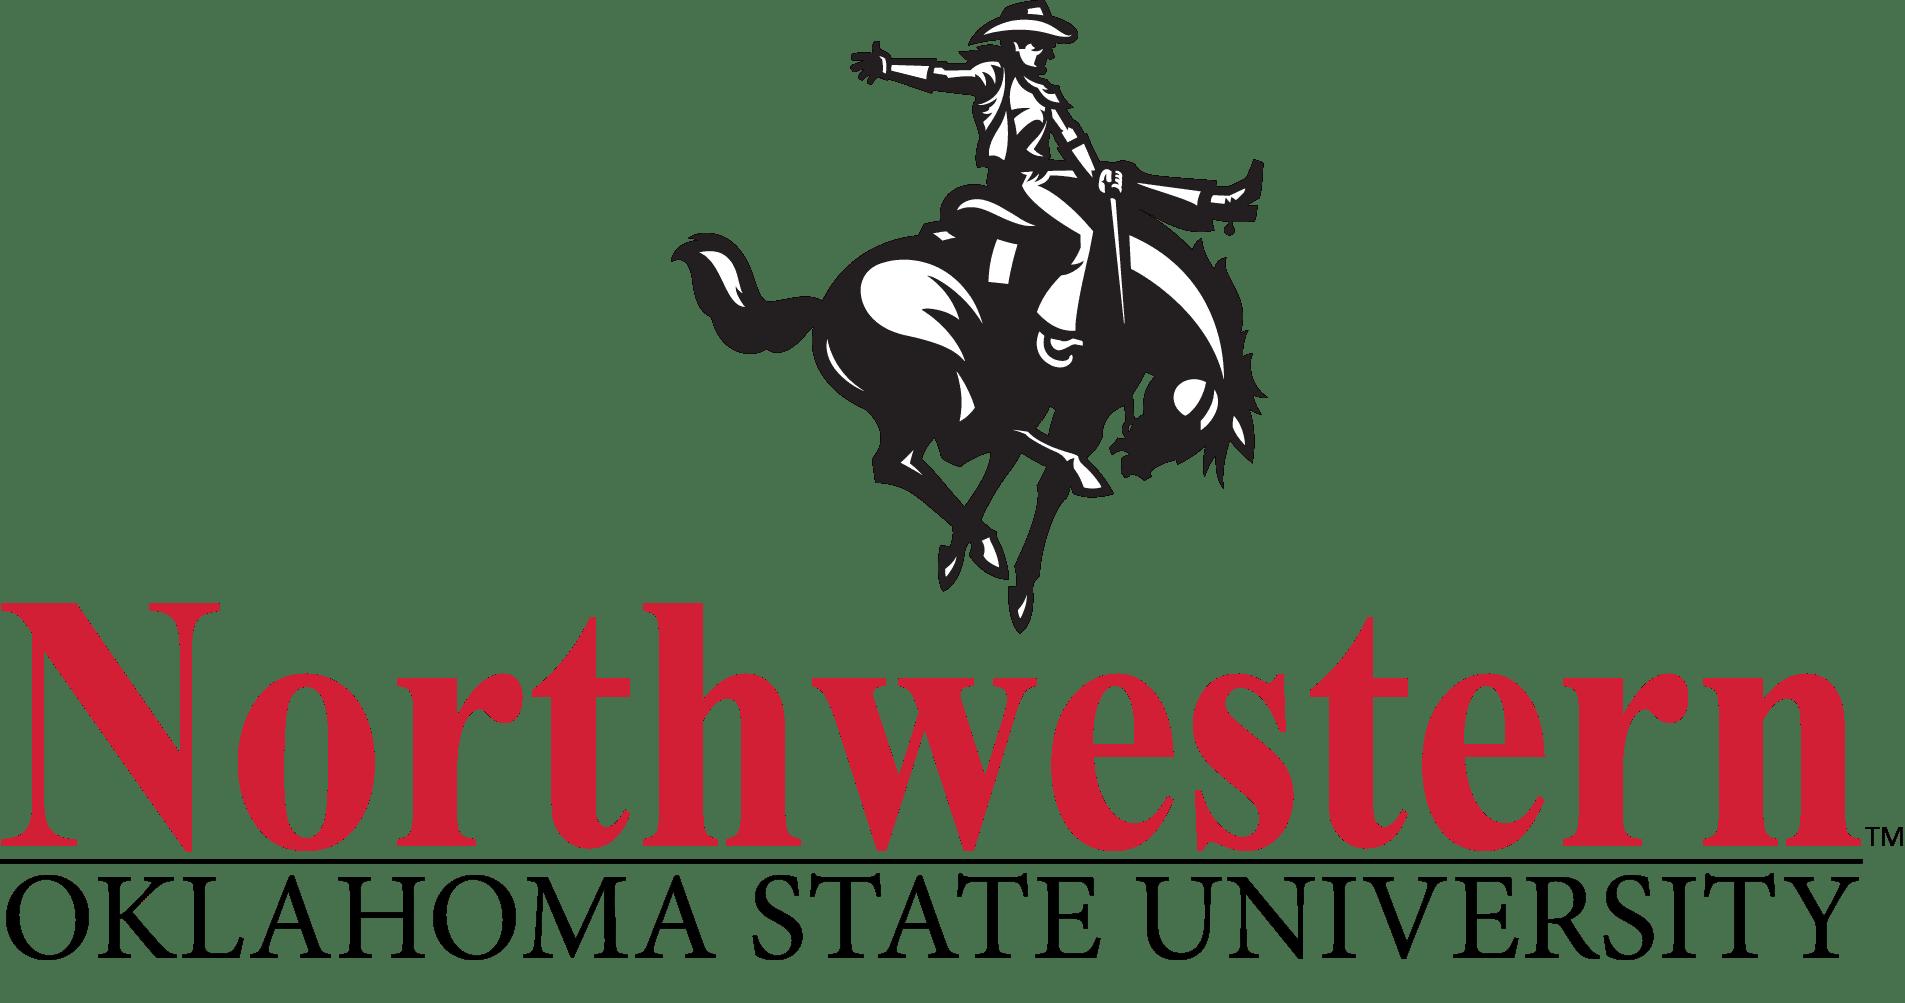 Northwestern Oklahoma State University (NWOSU)